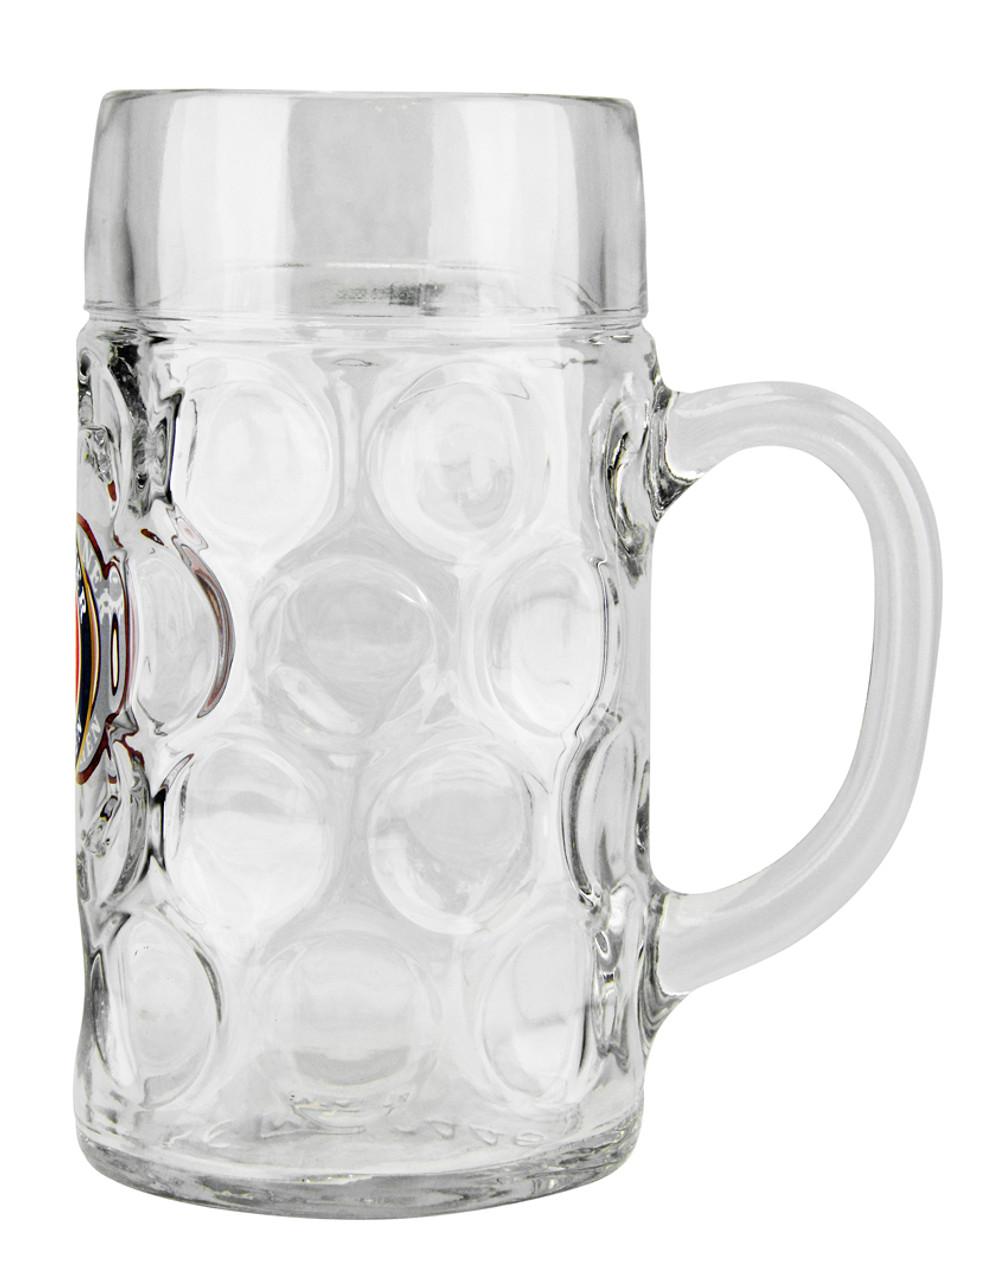 Oktoberfest Beer Mug with Paulaner Logo